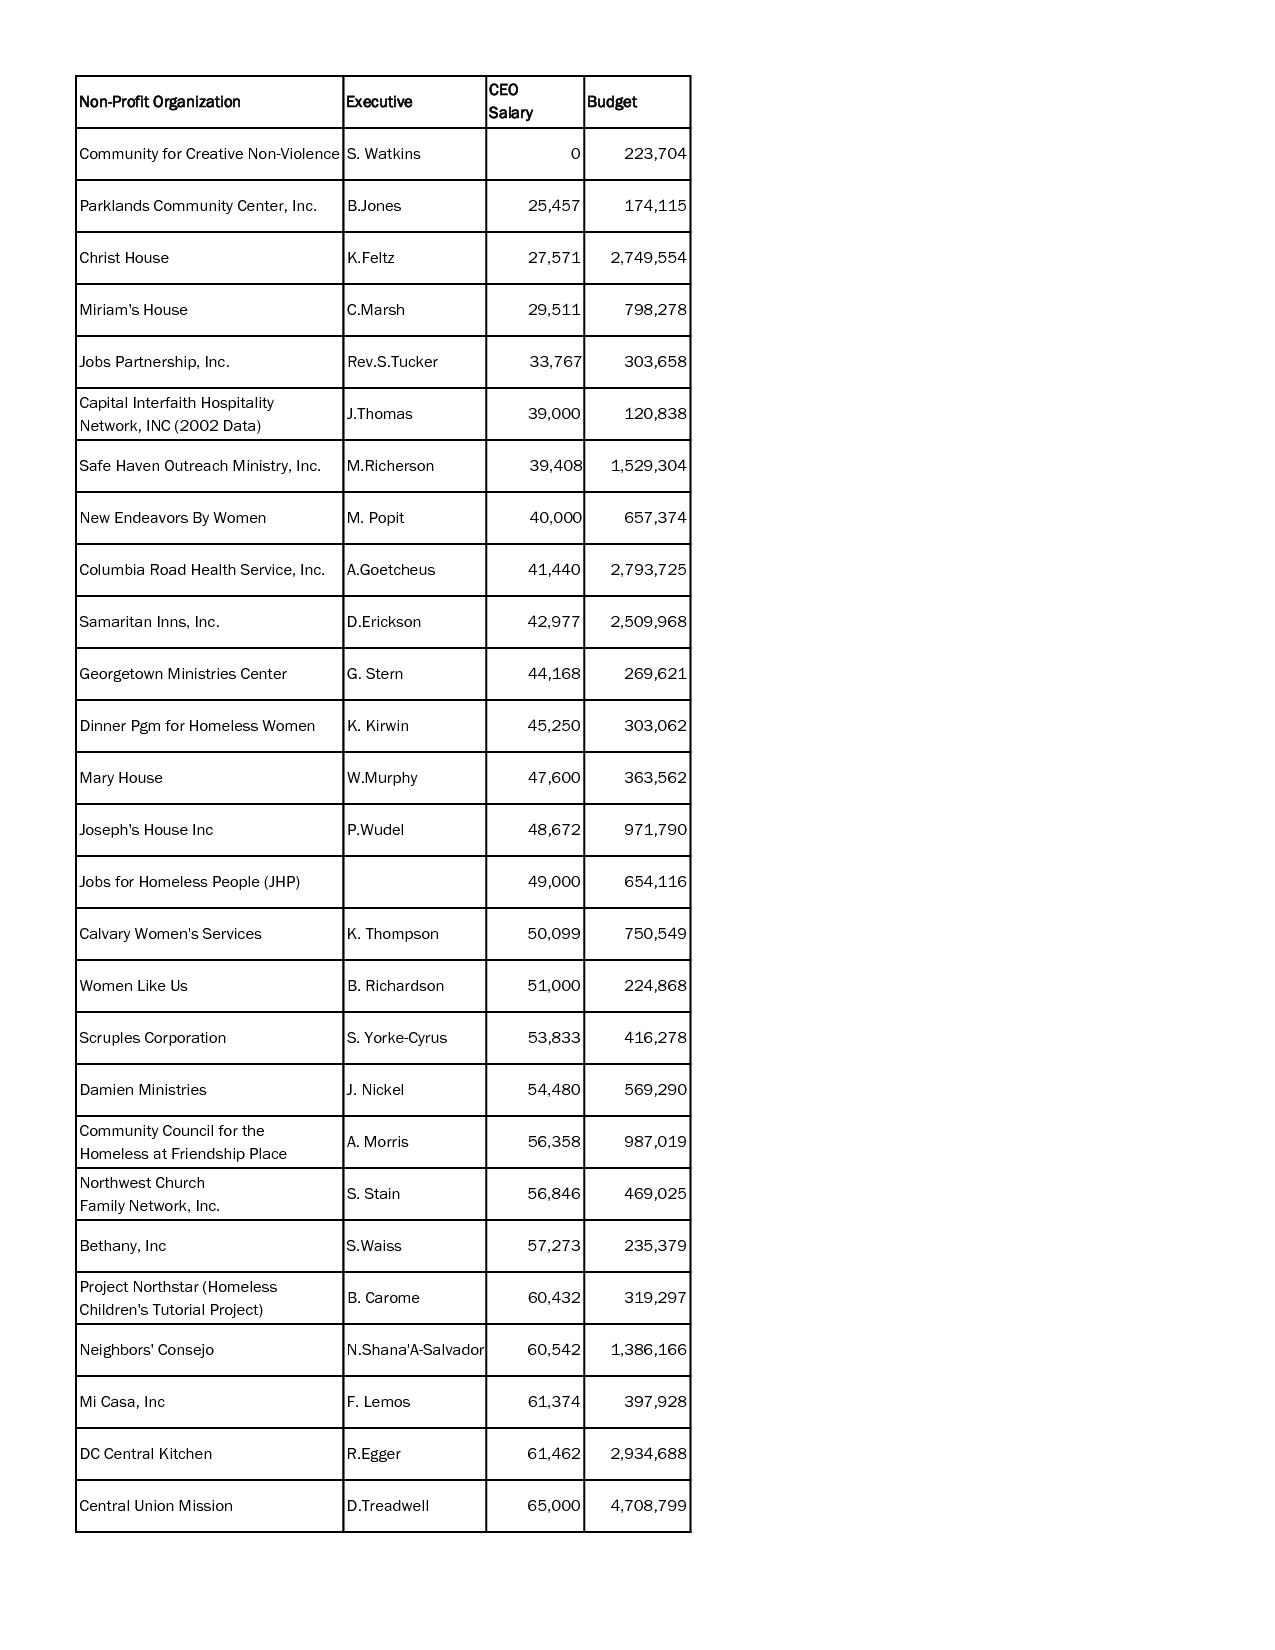 Non-Profit Organization Budget Template